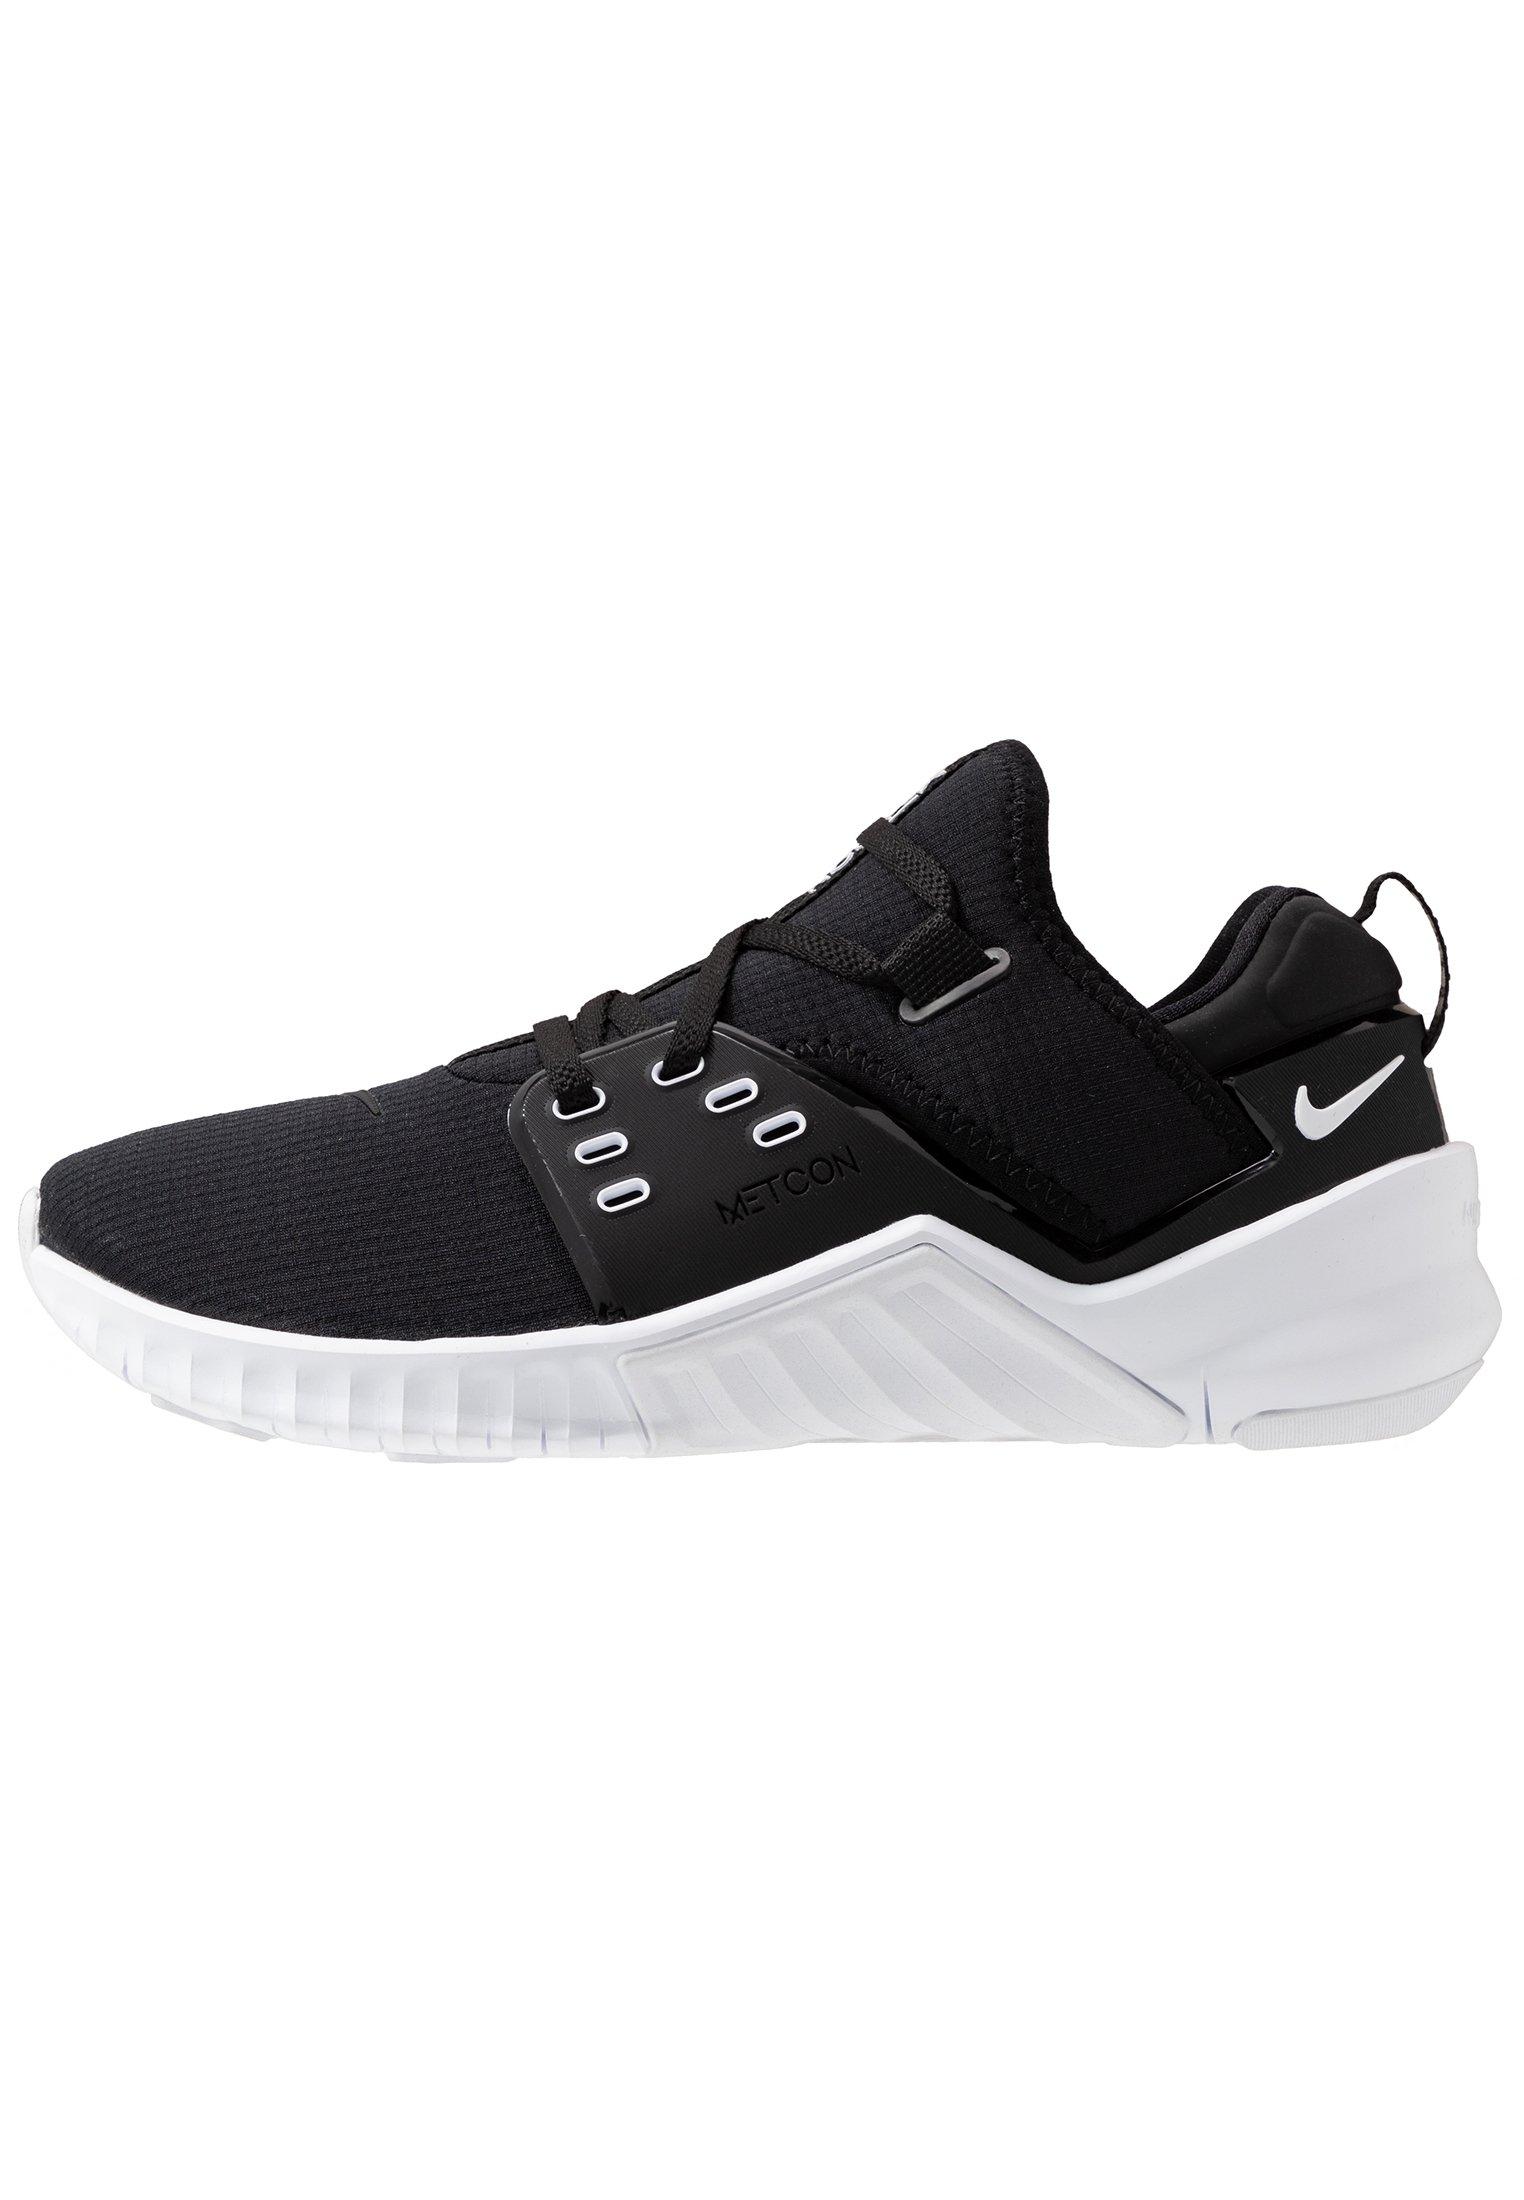 Nike Performance Free Metcon 2 - Trainers Black/white